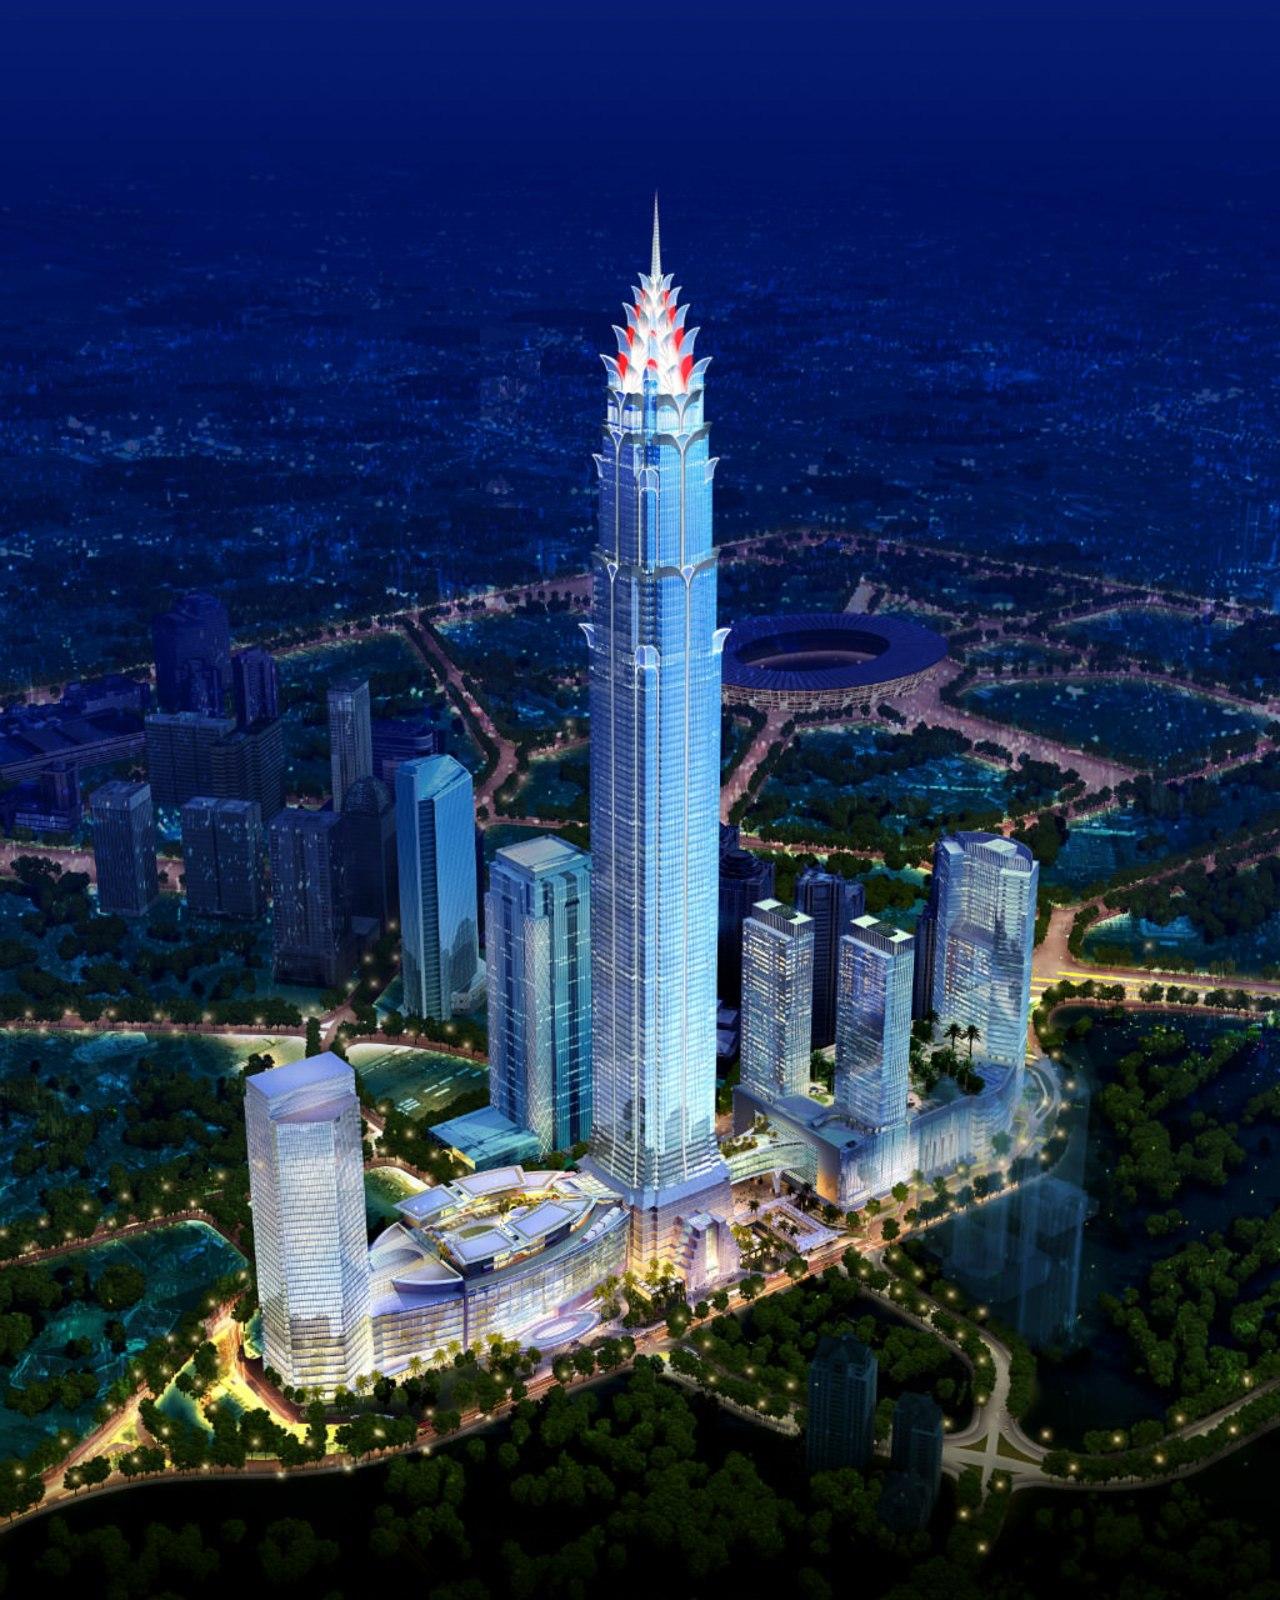 View of tower from above. aerial photography, bird's eye view, building, city, cityscape, daytime, landmark, metropolis, metropolitan area, night, sky, skyline, skyscraper, tower, tower block, urban area, blue